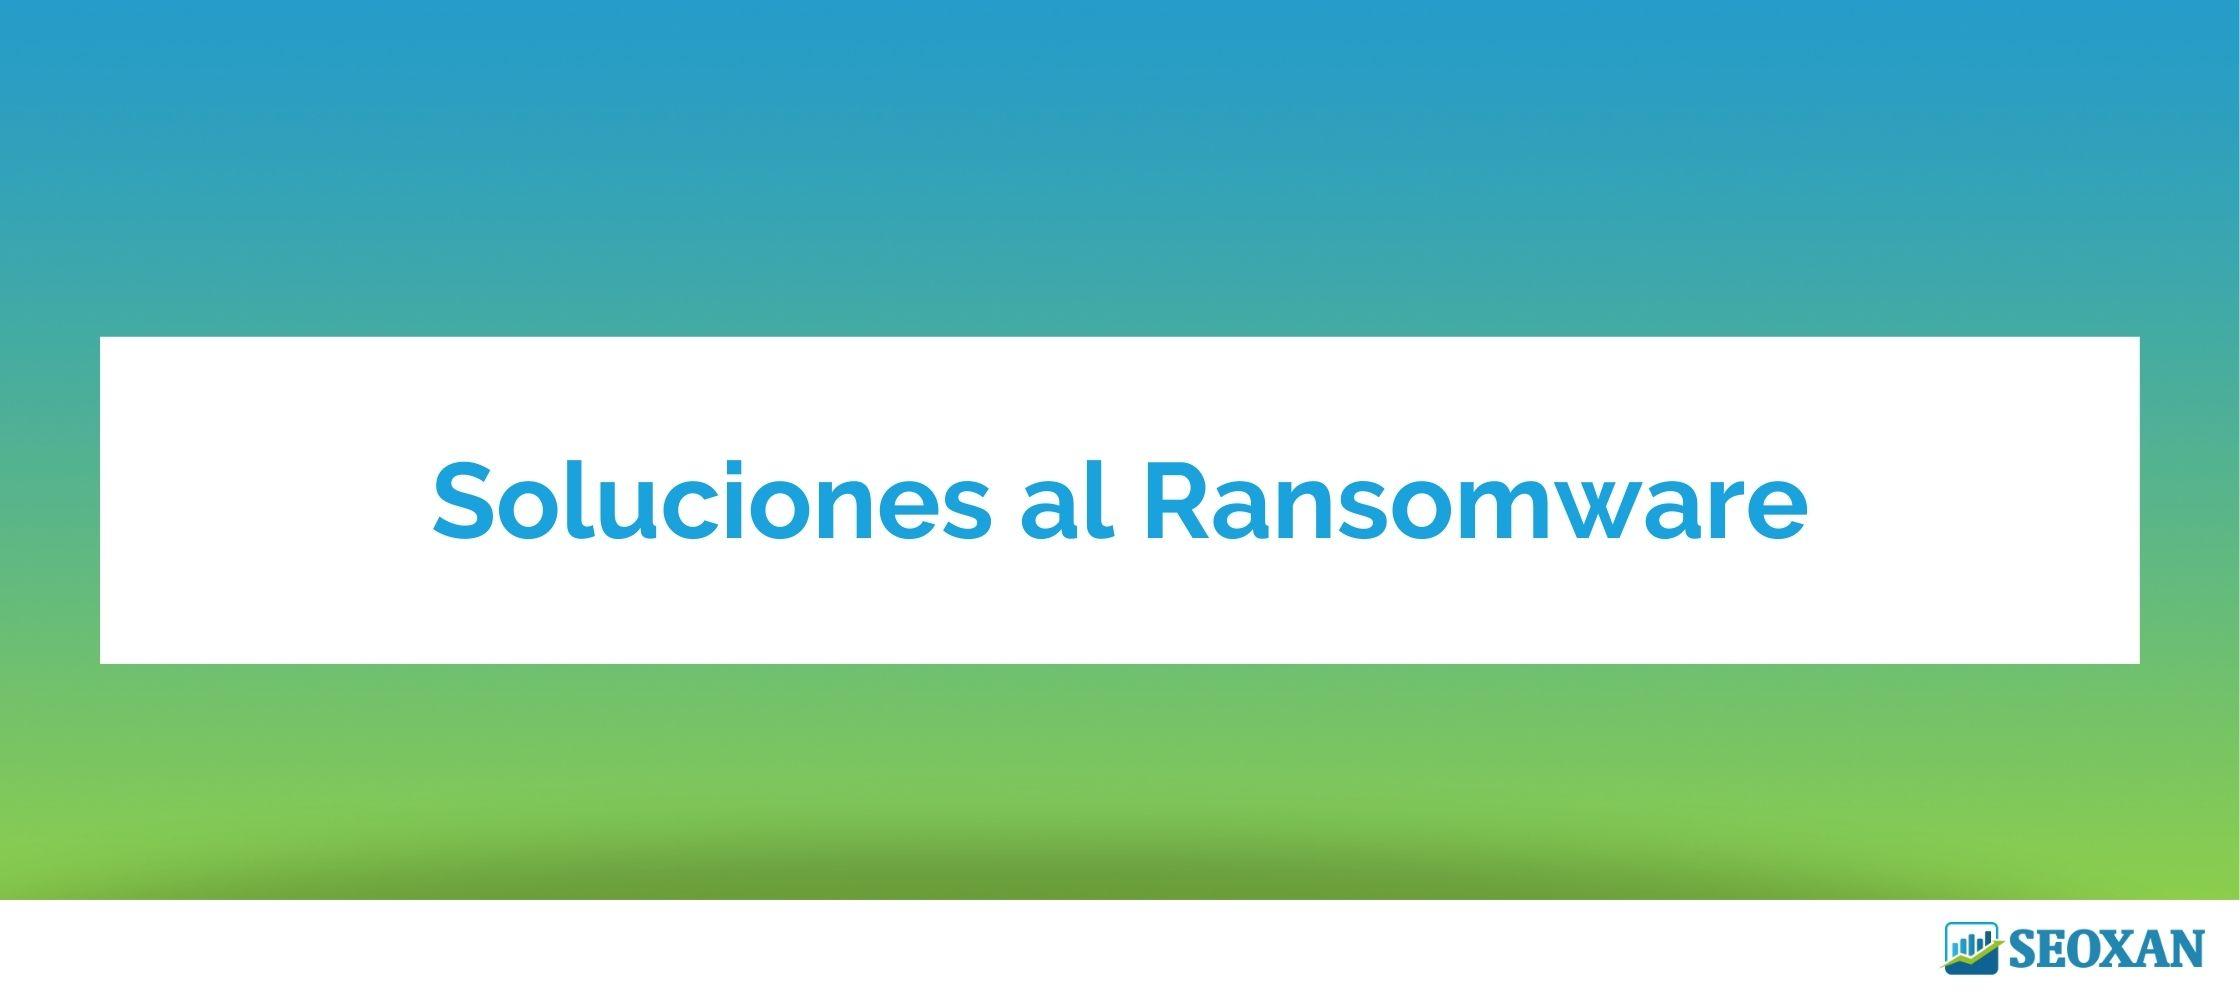 Soluciones al Ransomware